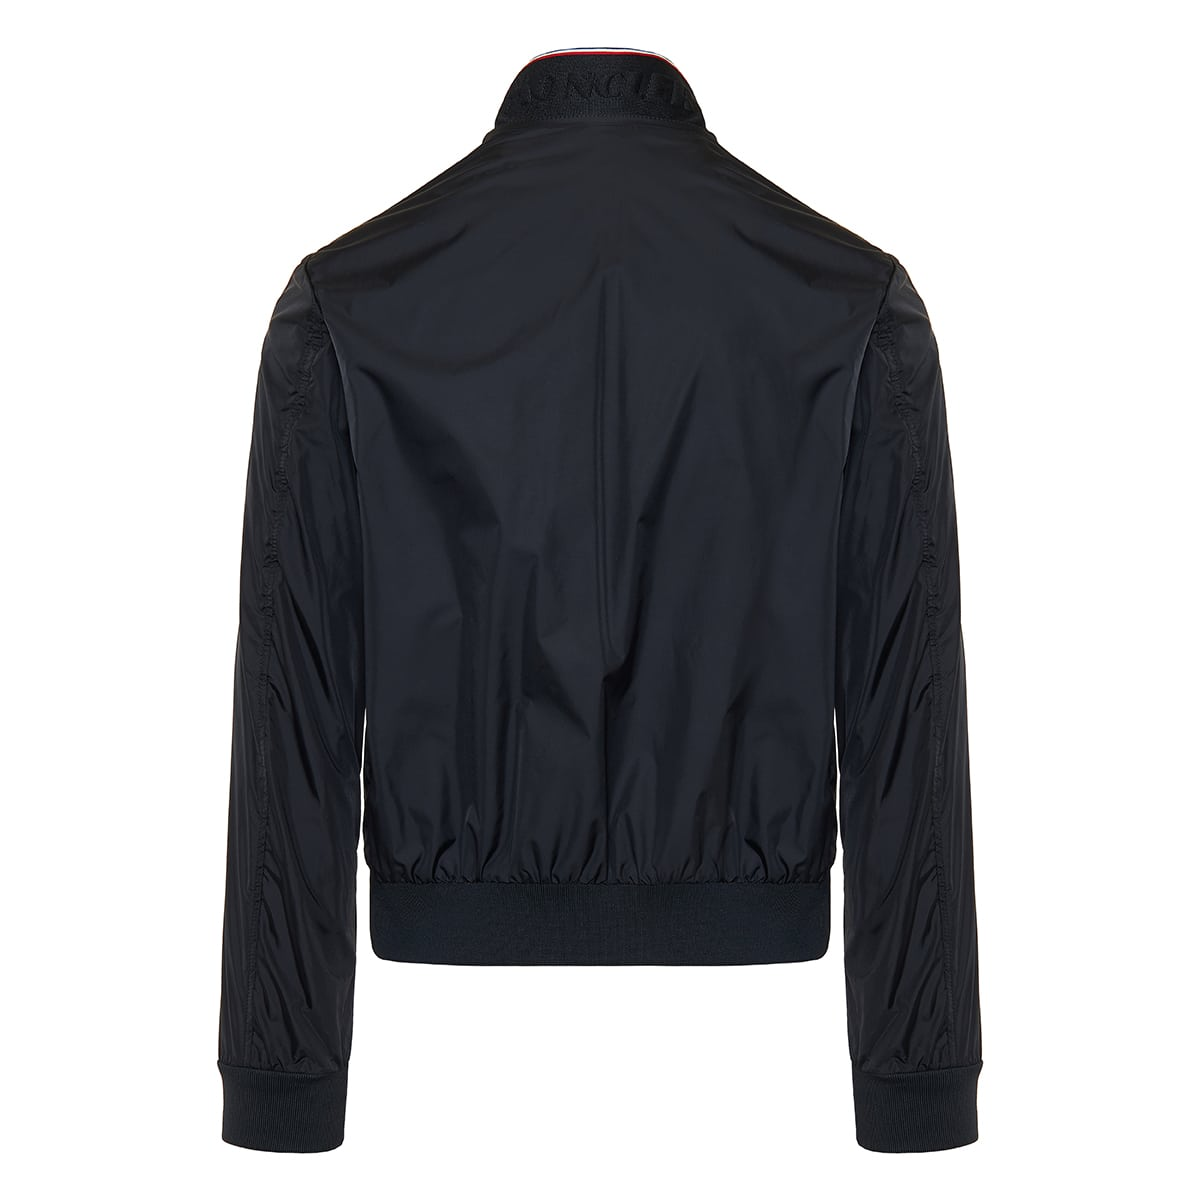 Reppe nylon jacket